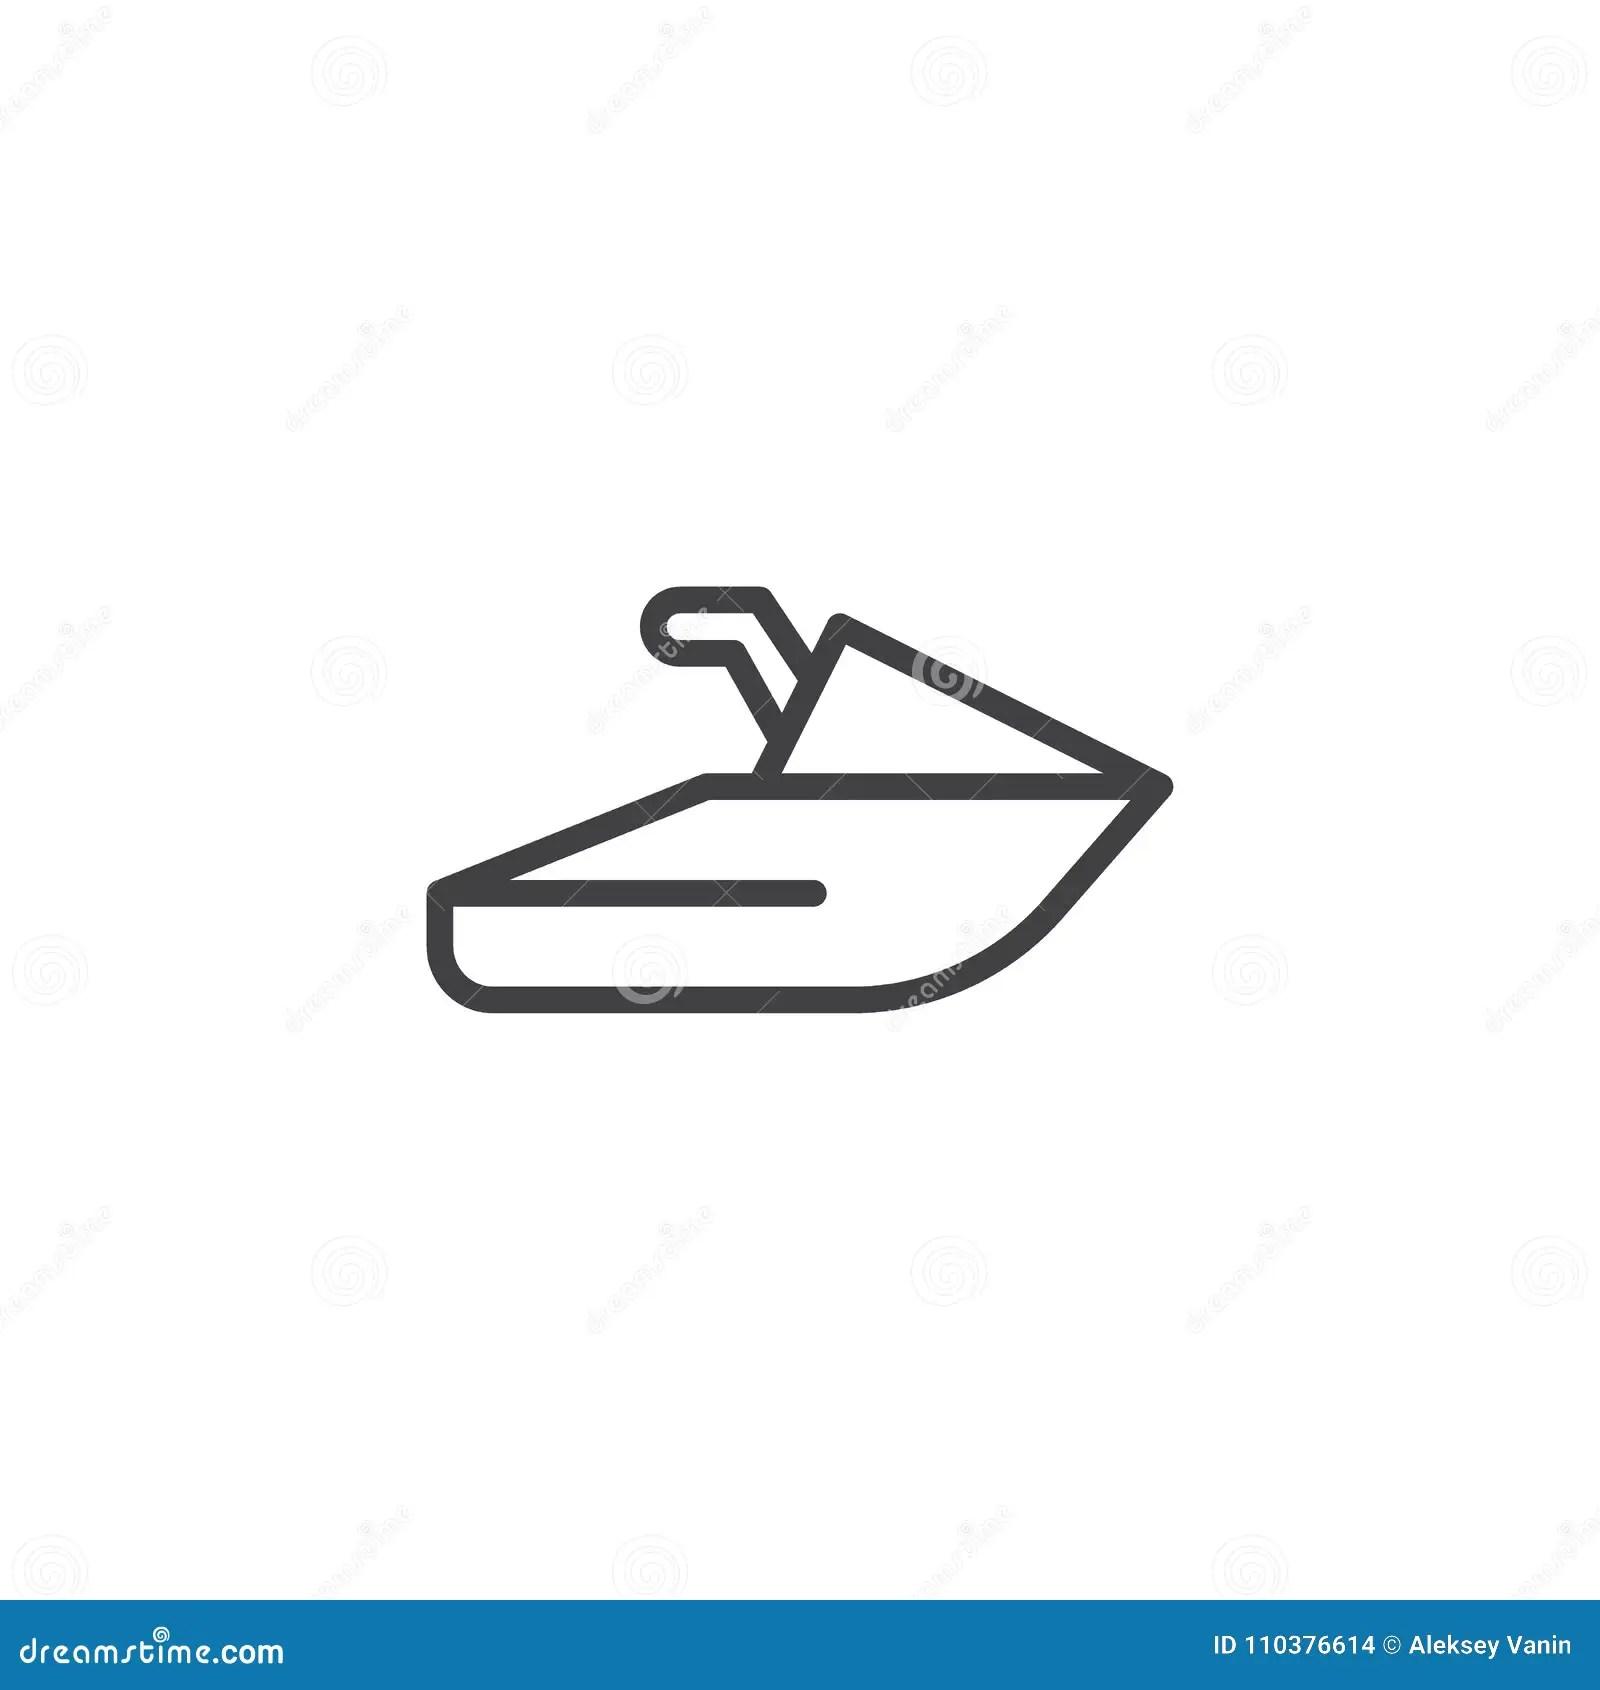 Jet ski outline icon stock vector. Illustration of sport